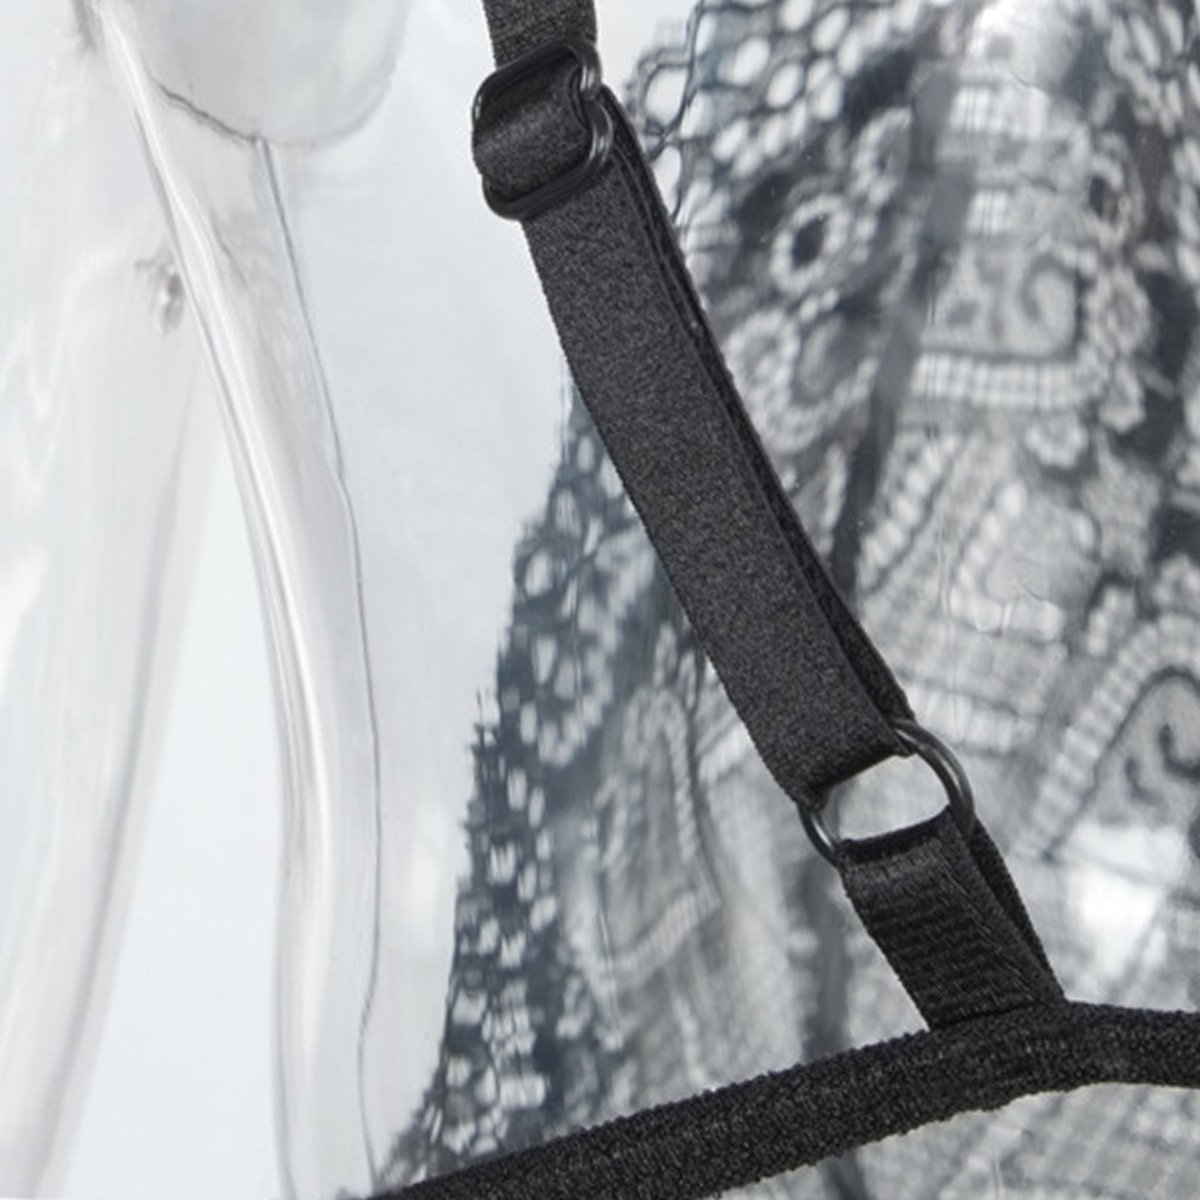 HTB10p1hPXXXXXaHaXXXq6xXFXXXB - FREE SHIPPING Women Lace Bralette Harness Wireless Halter JKP291